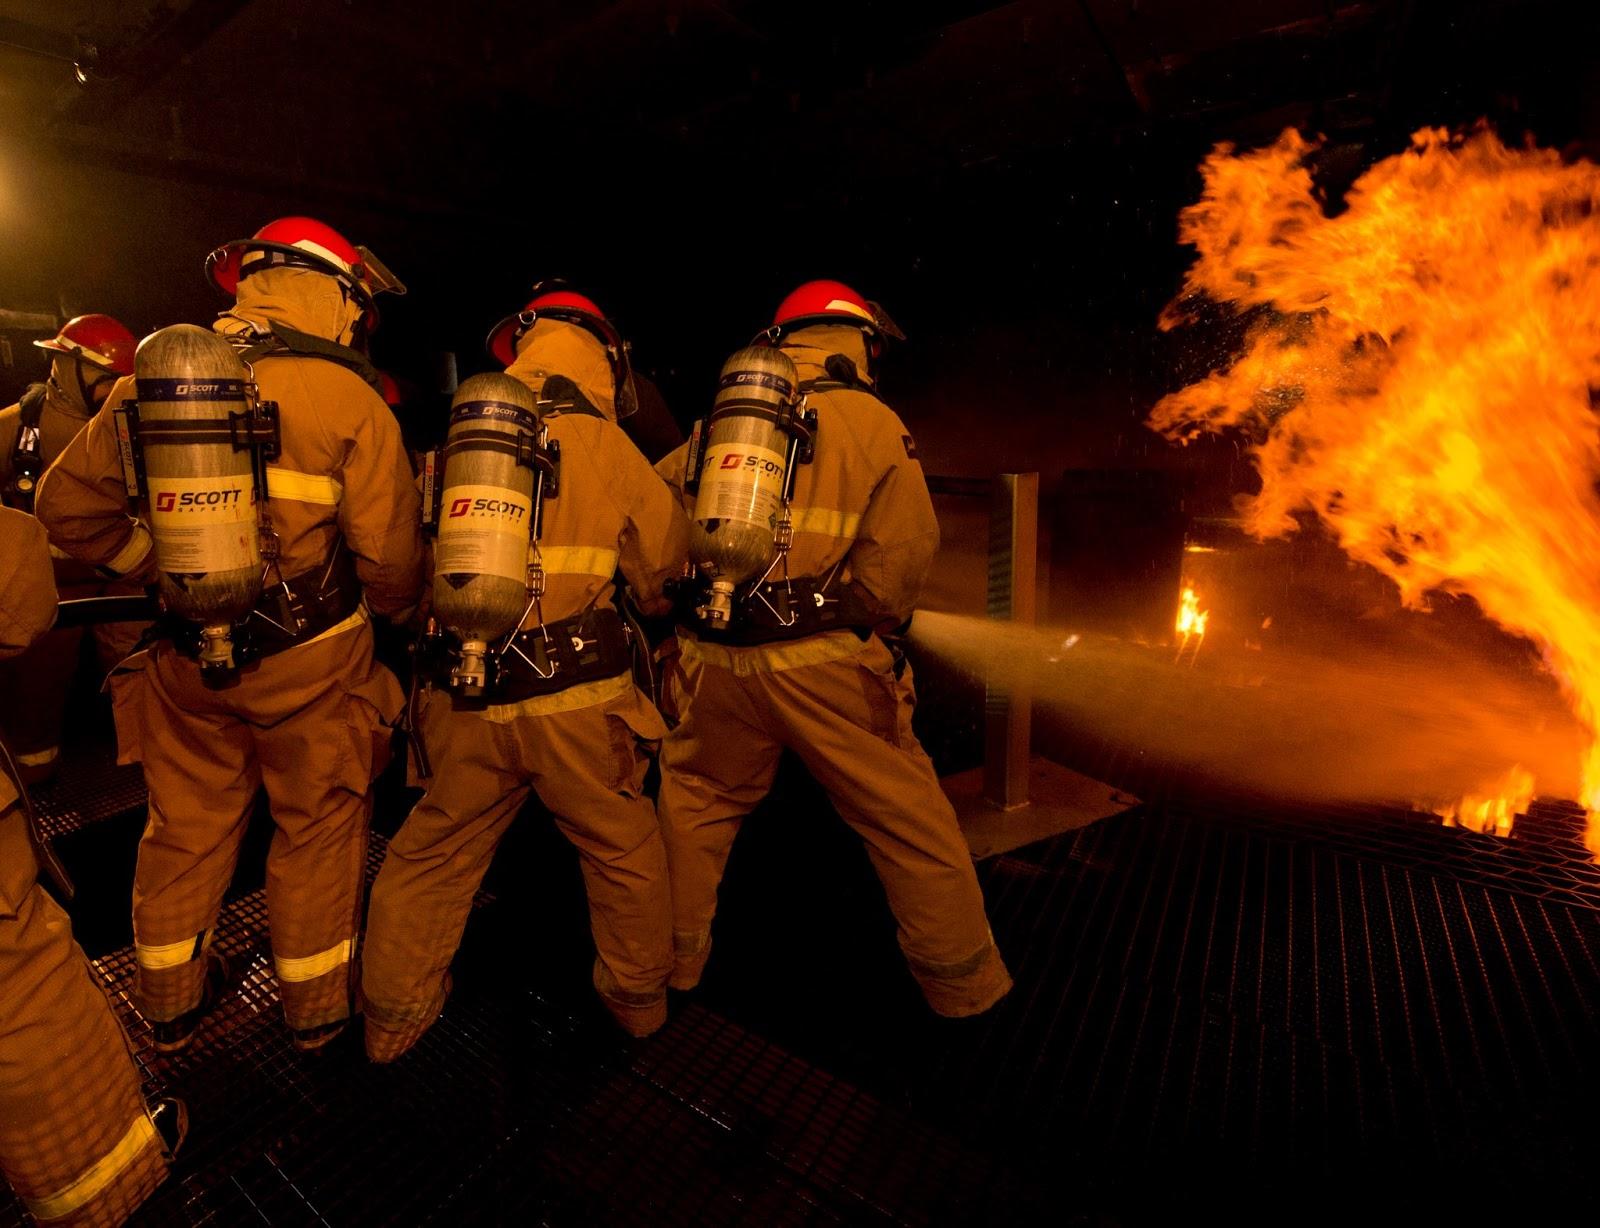 paul davis on crime cool navy photo u s navy sailors firefighters